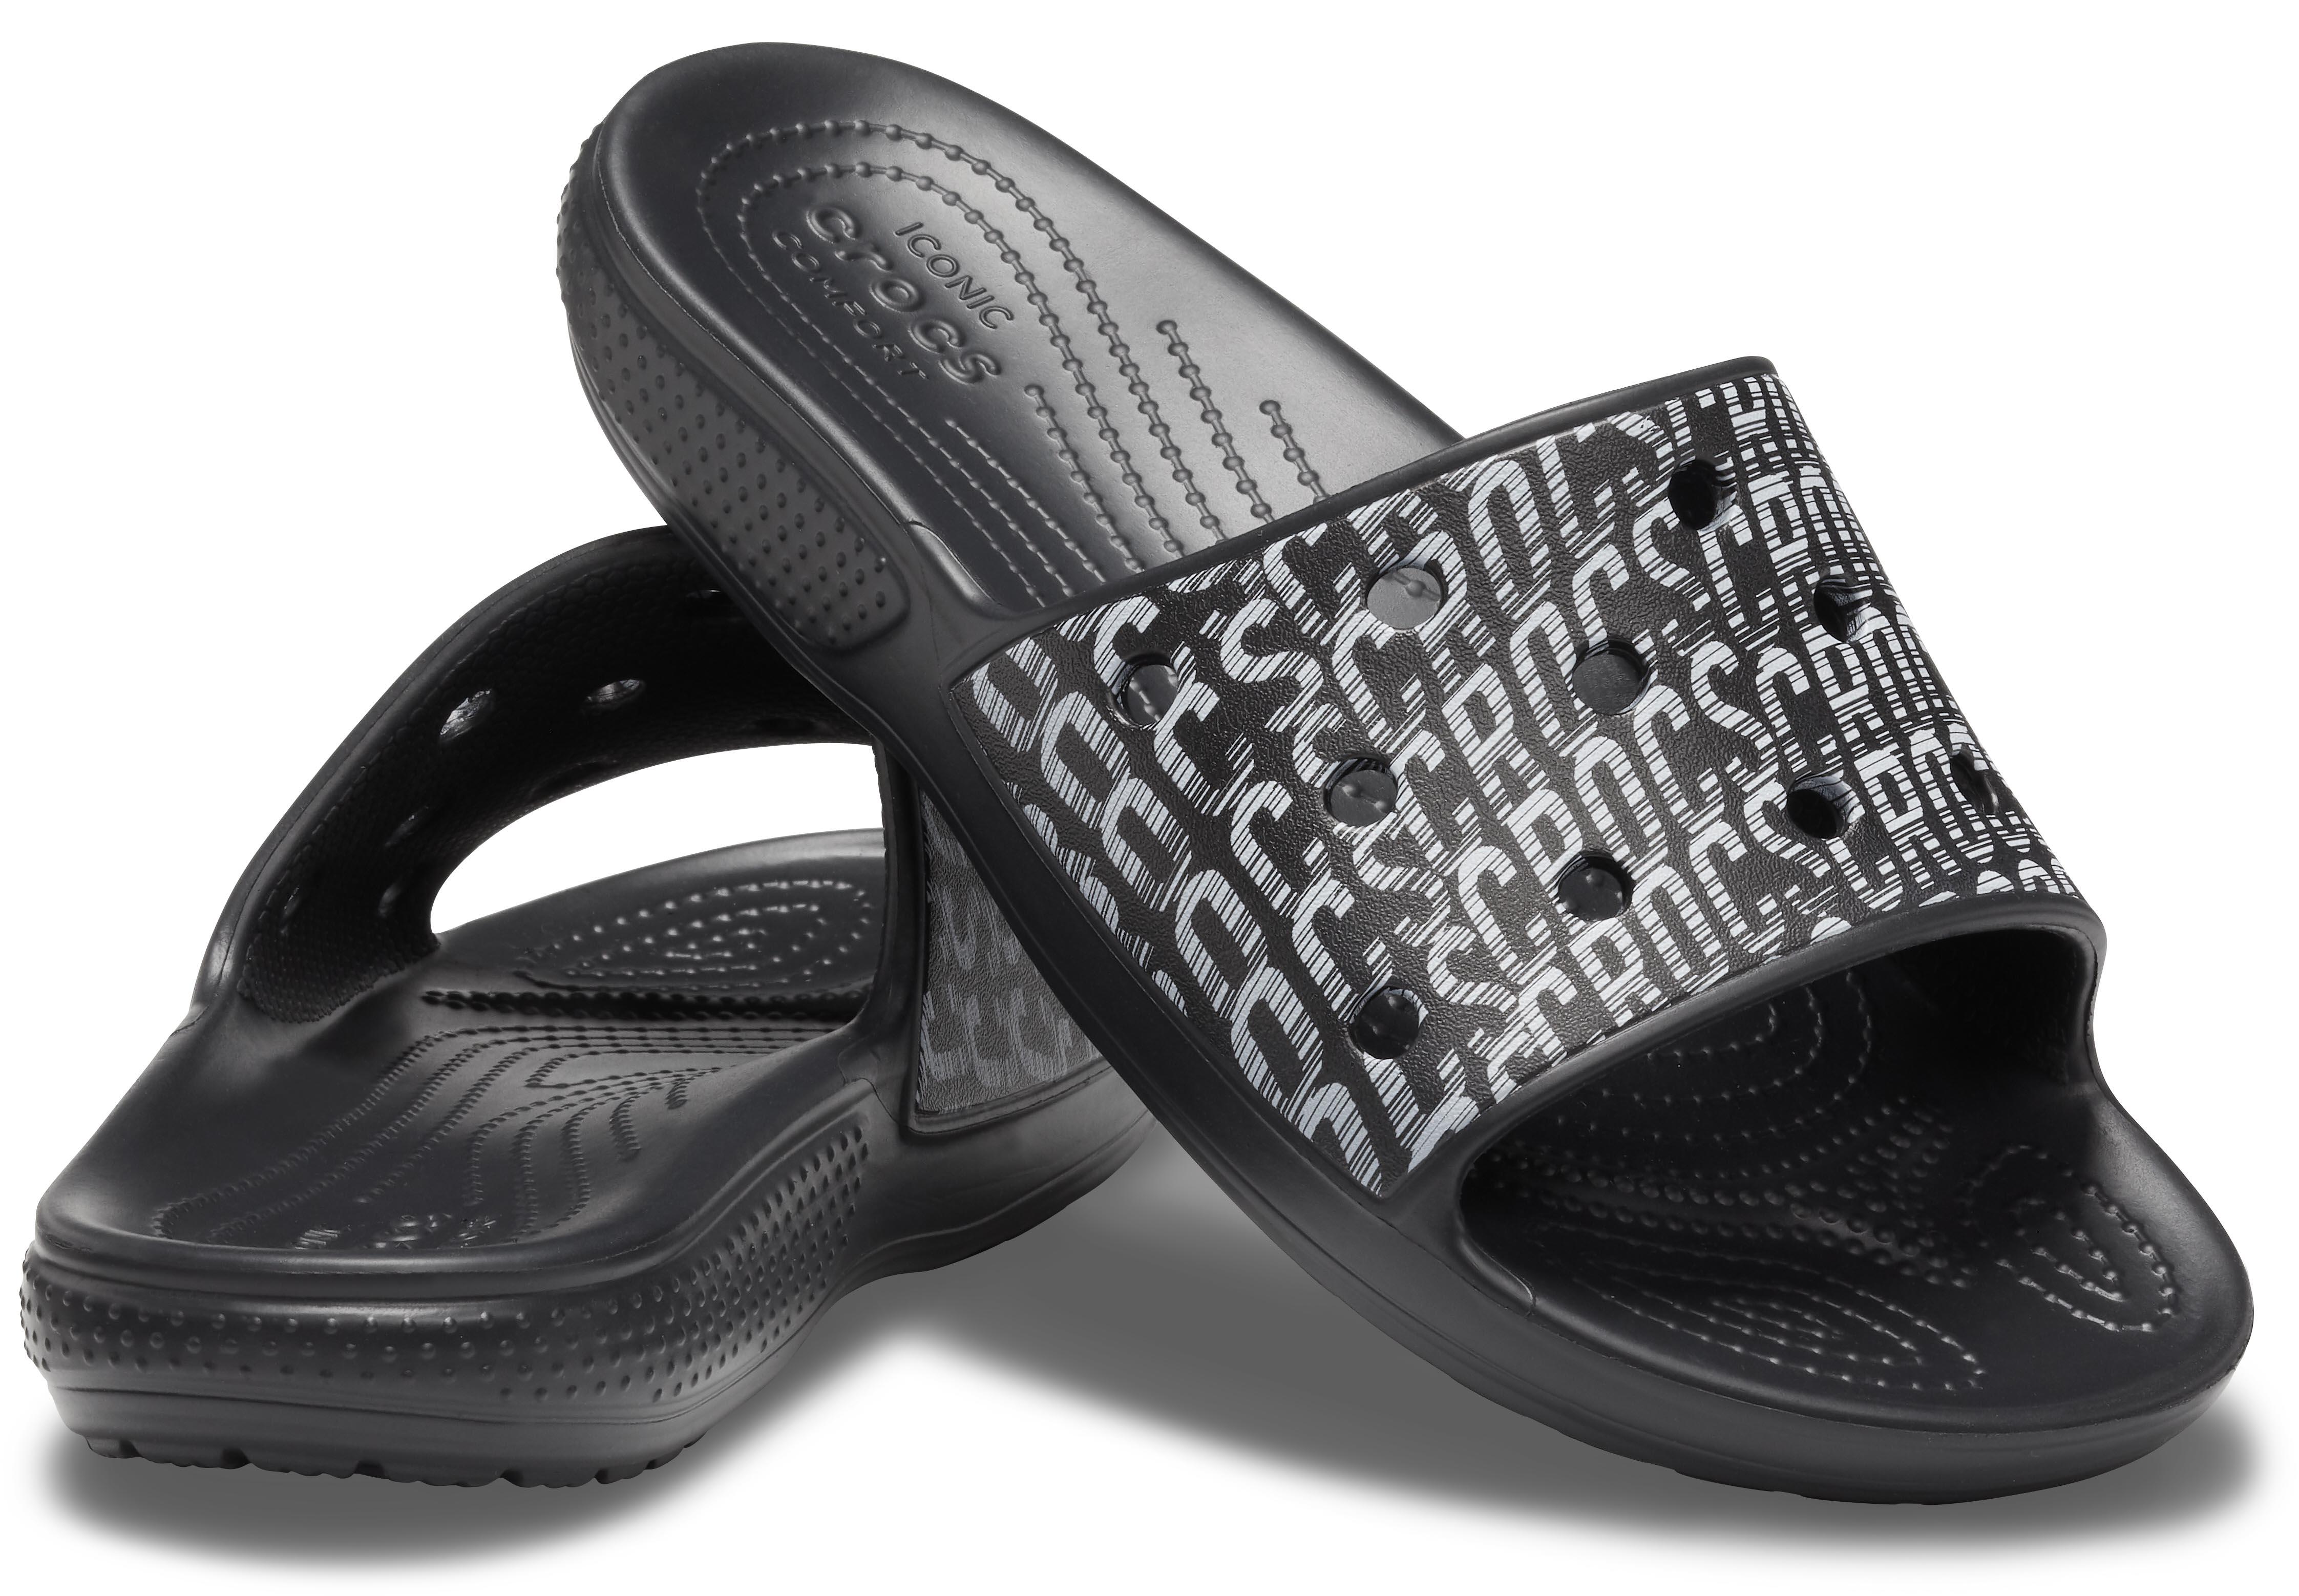 crocs classic crocs logo motion slide black/white クラシック クロックス ロゴ モーション スライド ブラック/ホワイト